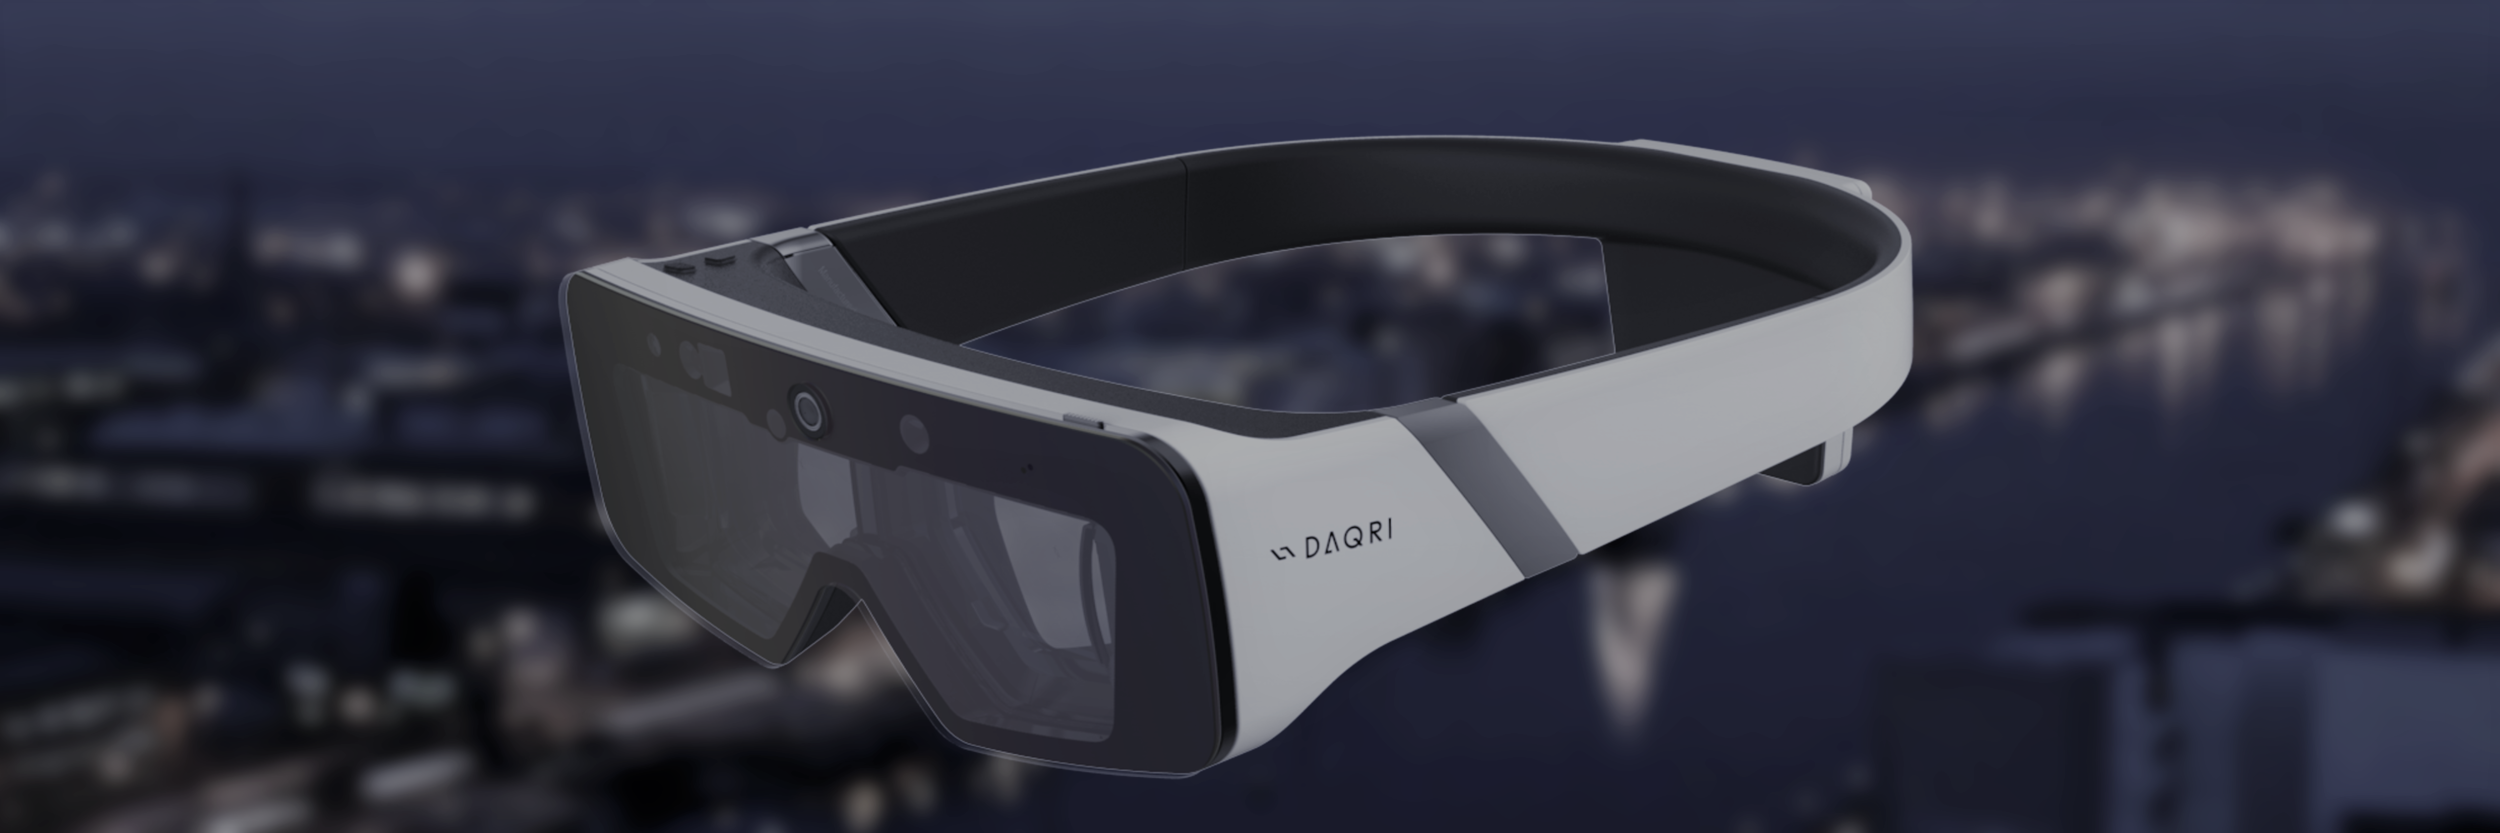 DAQRI Smart Devices -